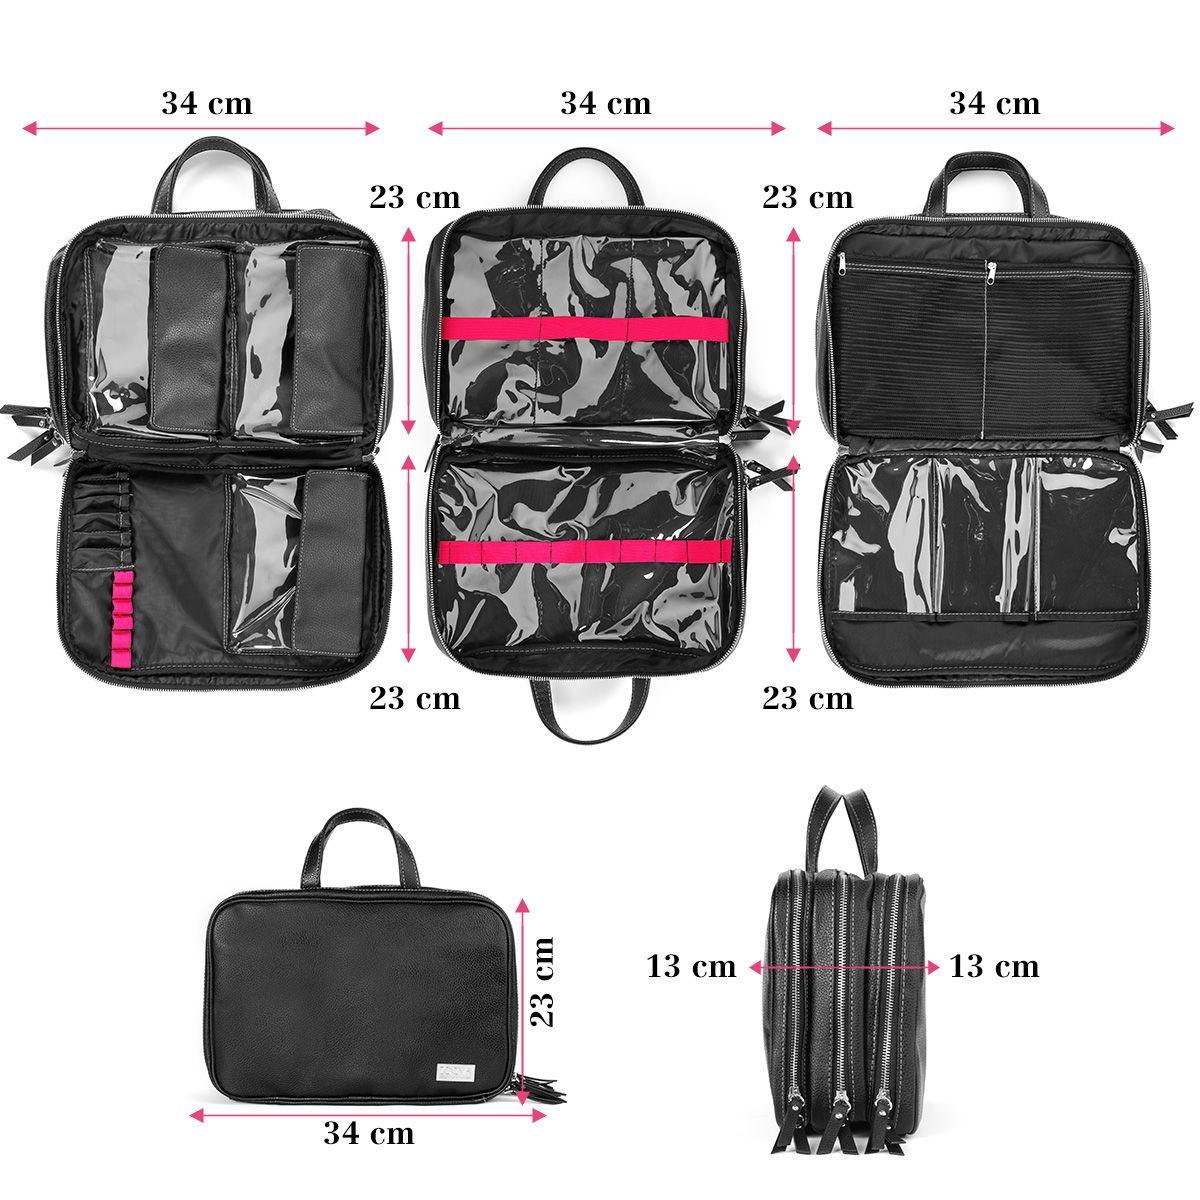 Zoeva Makeup Tote Zoe Bag Endless Storage Opprtunities Https Www Zoeva Shop De En Makeup Tote Zoe Bag A 8000357 Kain